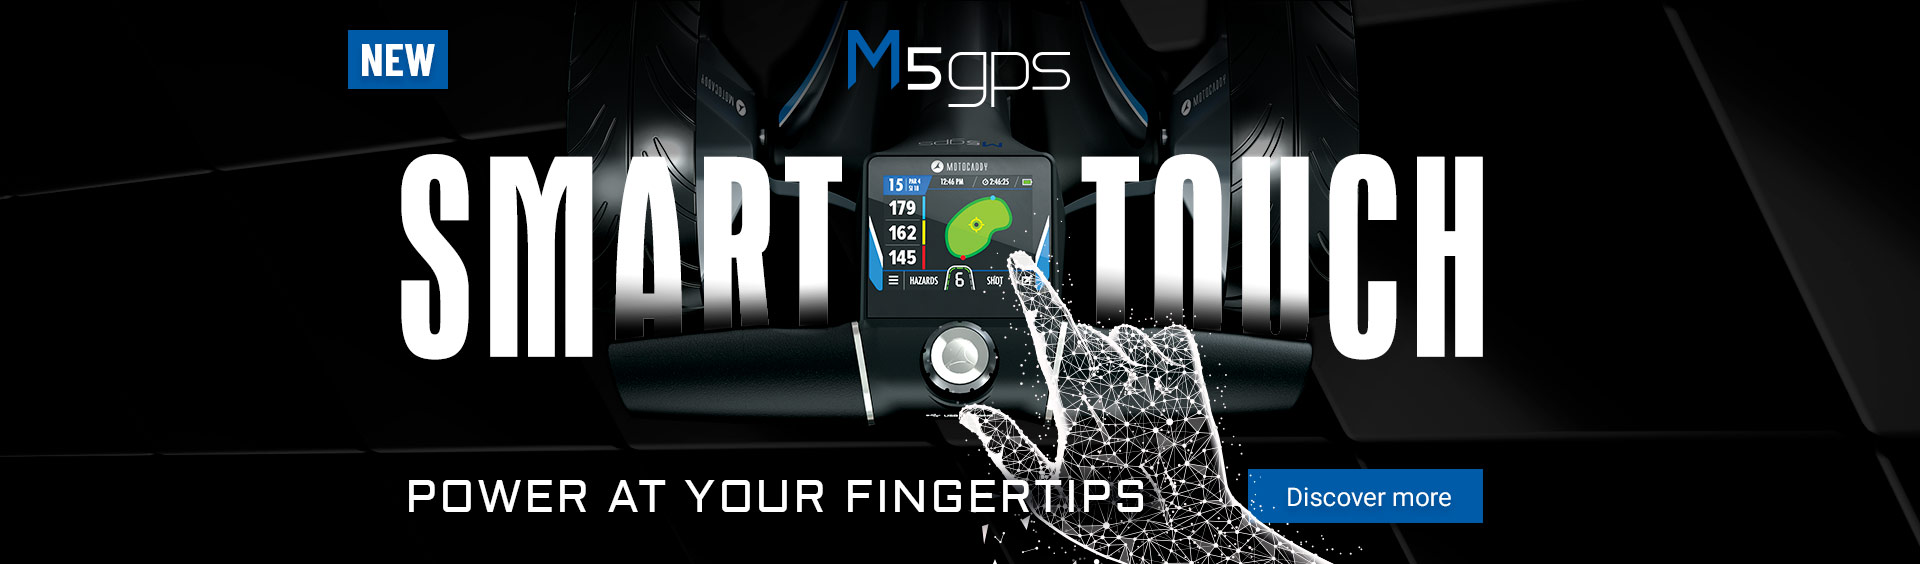 M5 GPS Electric Trolley